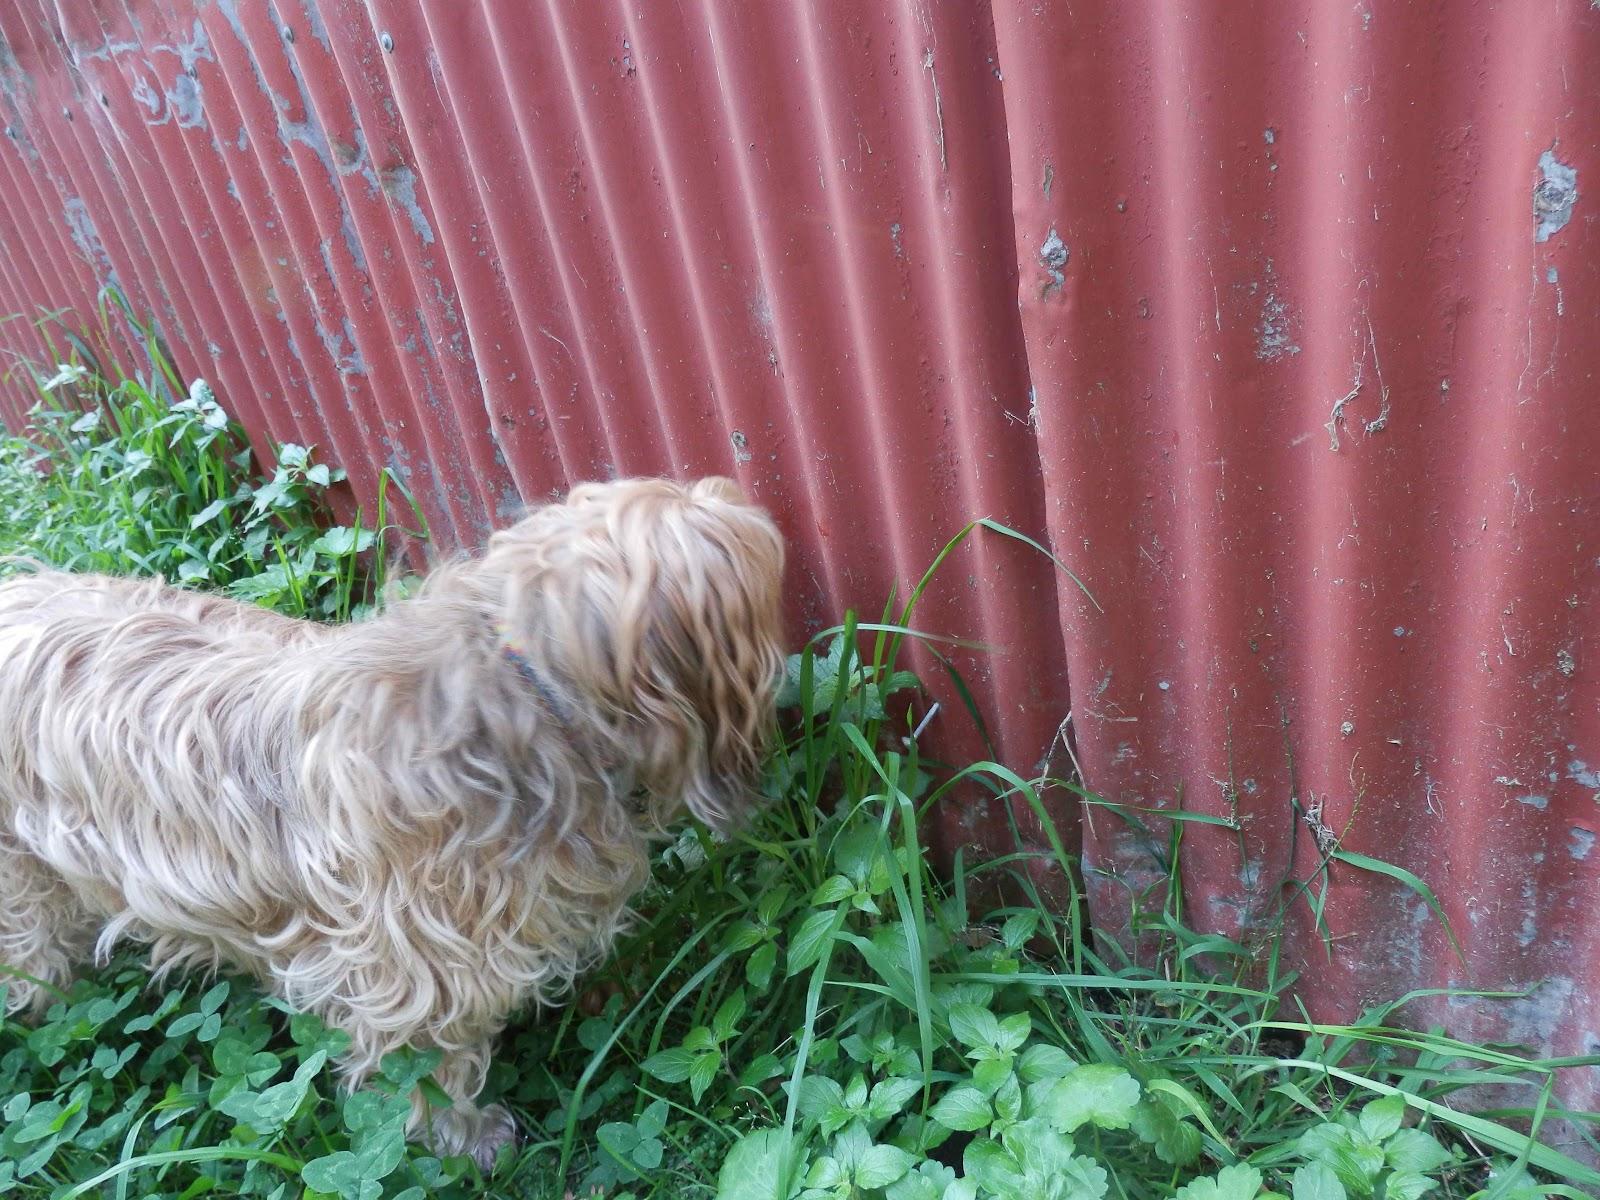 my dog: a dog eats grass after vomiting